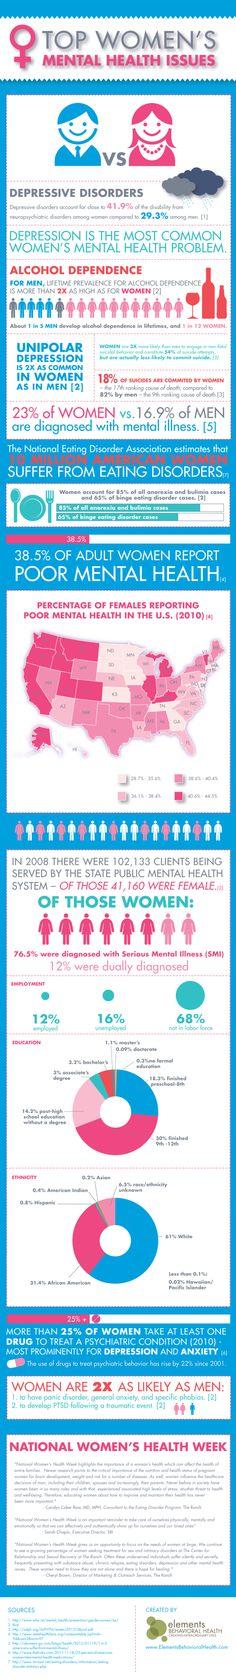 Mental Health – Infographic List